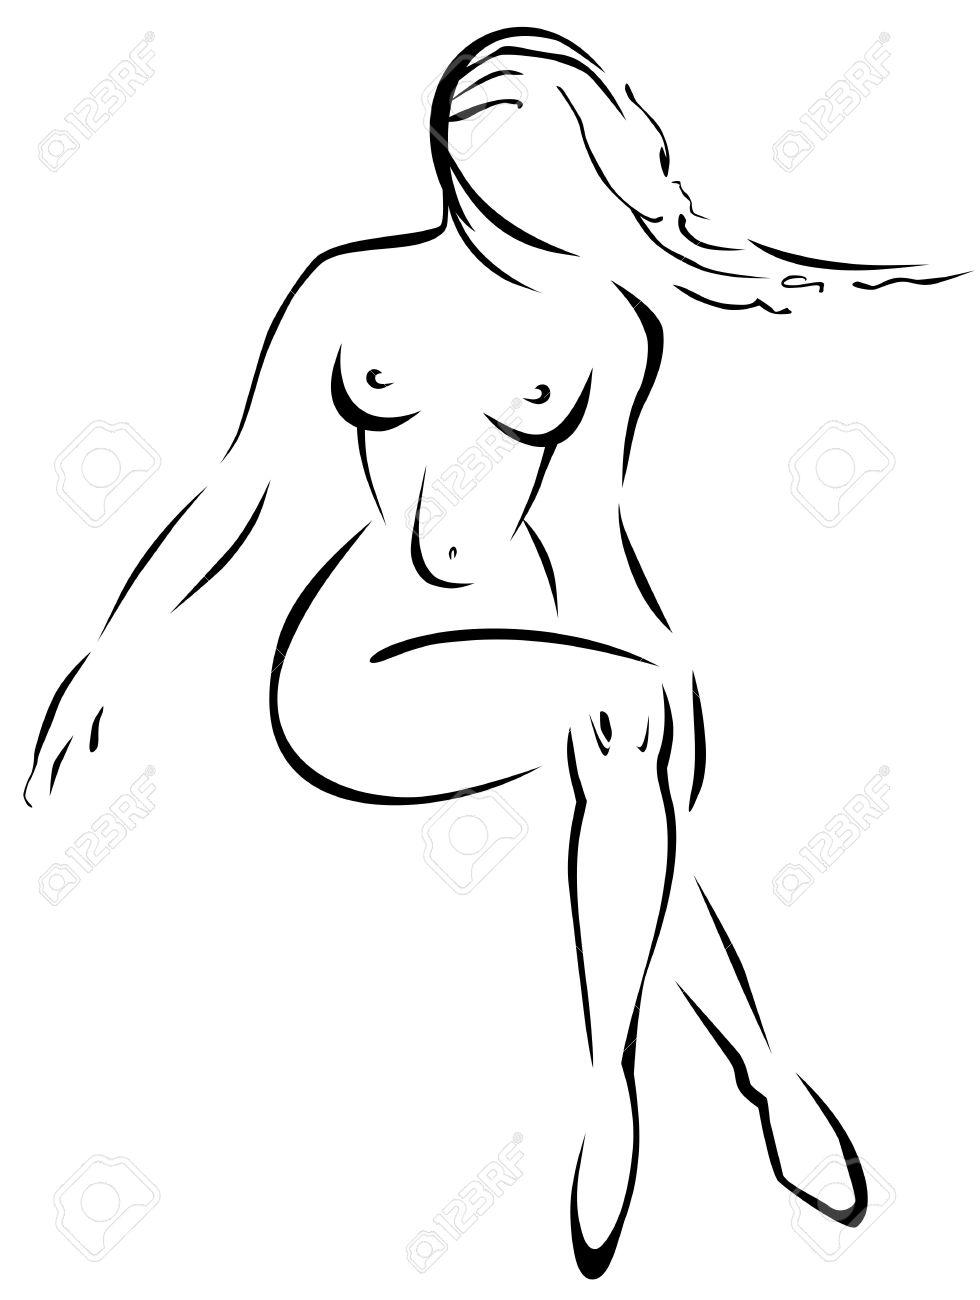 Раскраски голые девушки